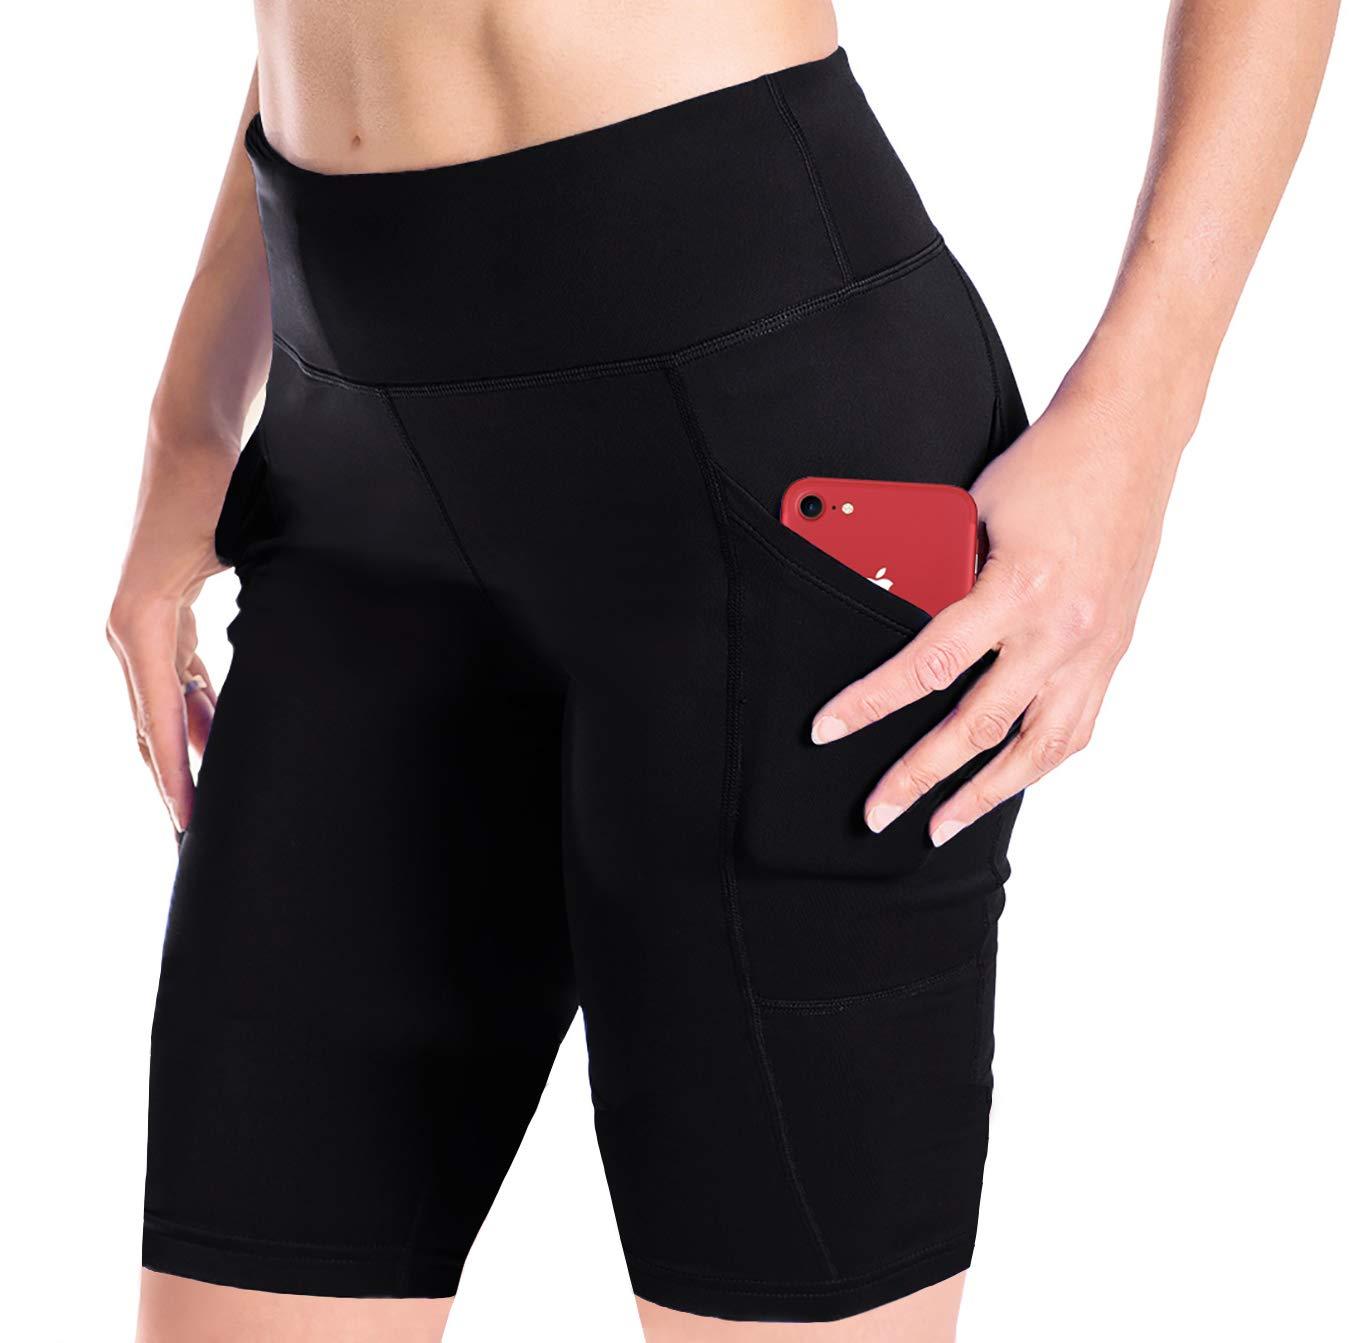 Yogipace Women's 10'' Inseam Compression Workout Shorts Bike Short Side Pockets Black Size S